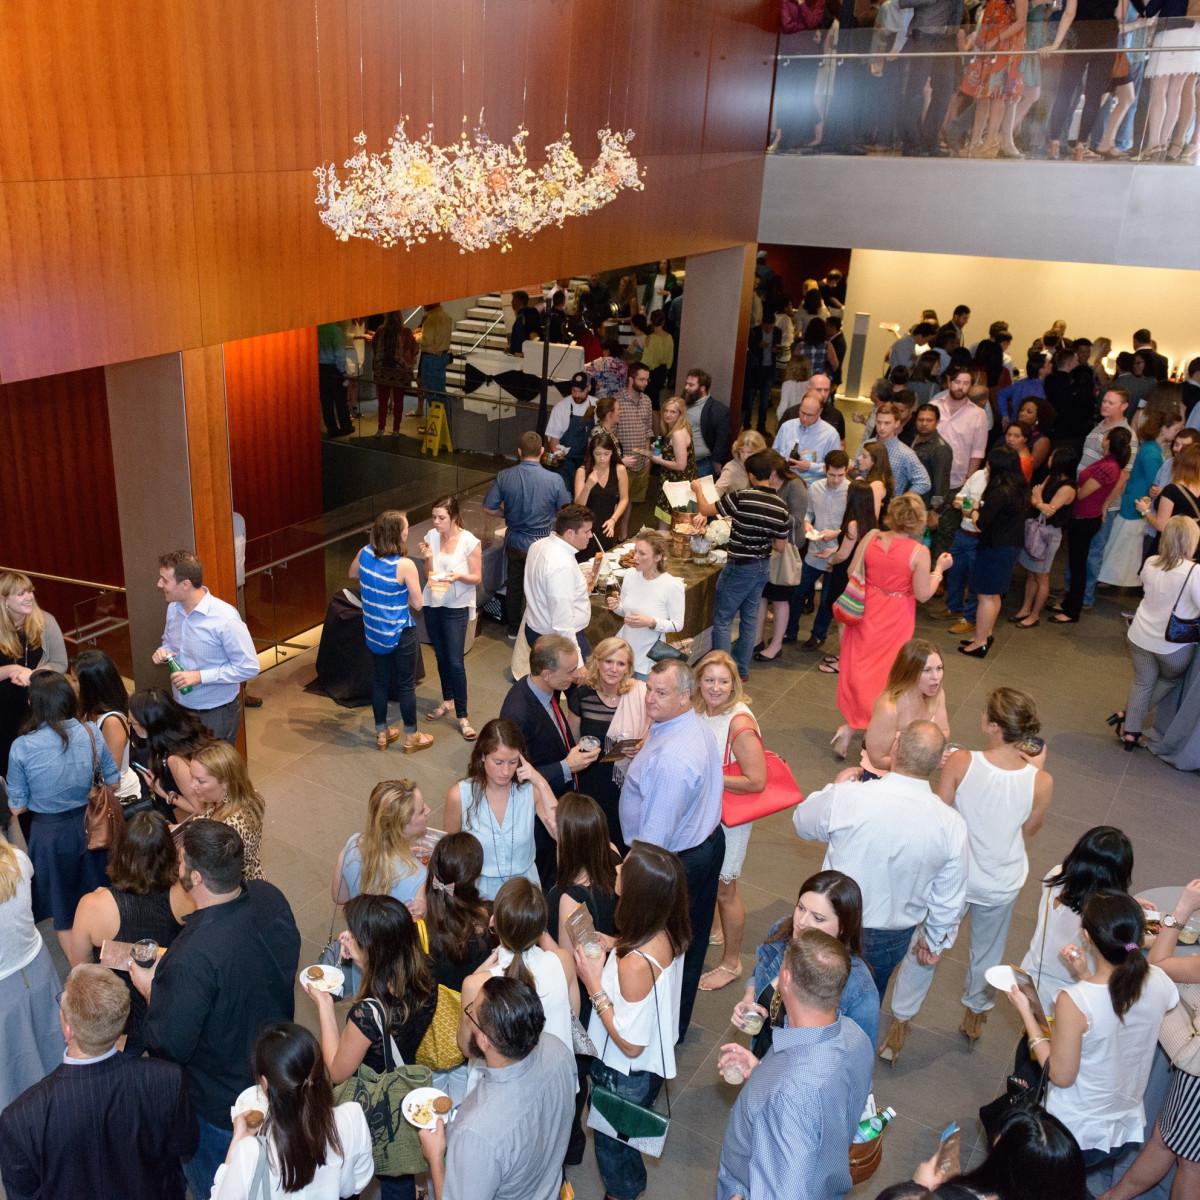 Tastemakers Houston 5/16 Asia Society Houston